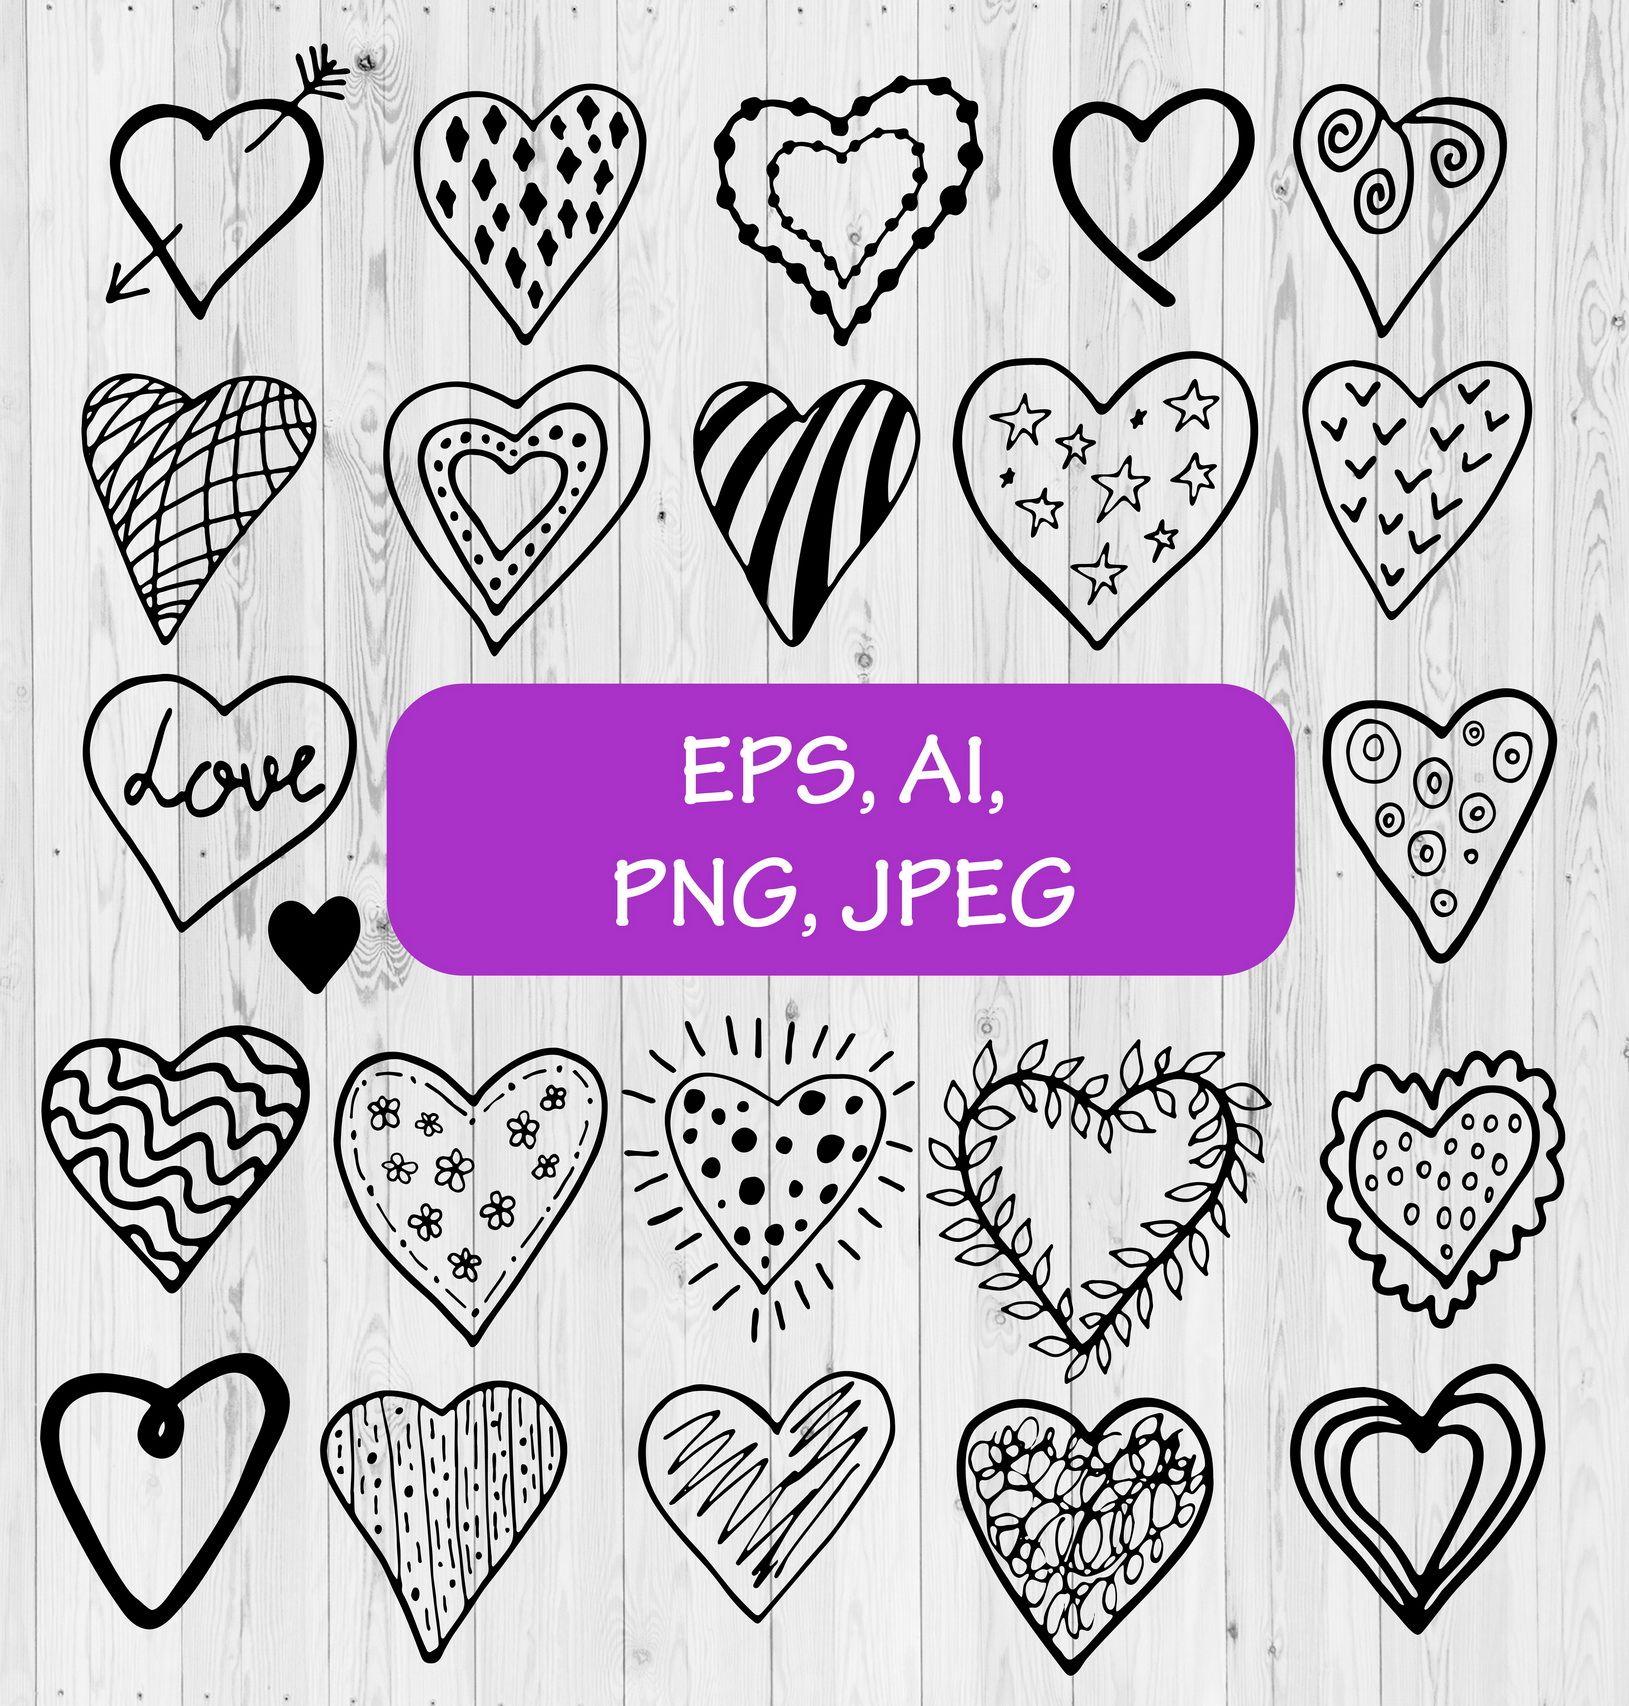 Valentines Day Clipart Png Valentine Clipart 22 Black And White Hearts Valentines Day Clipart Clip Art Valentine Clipart